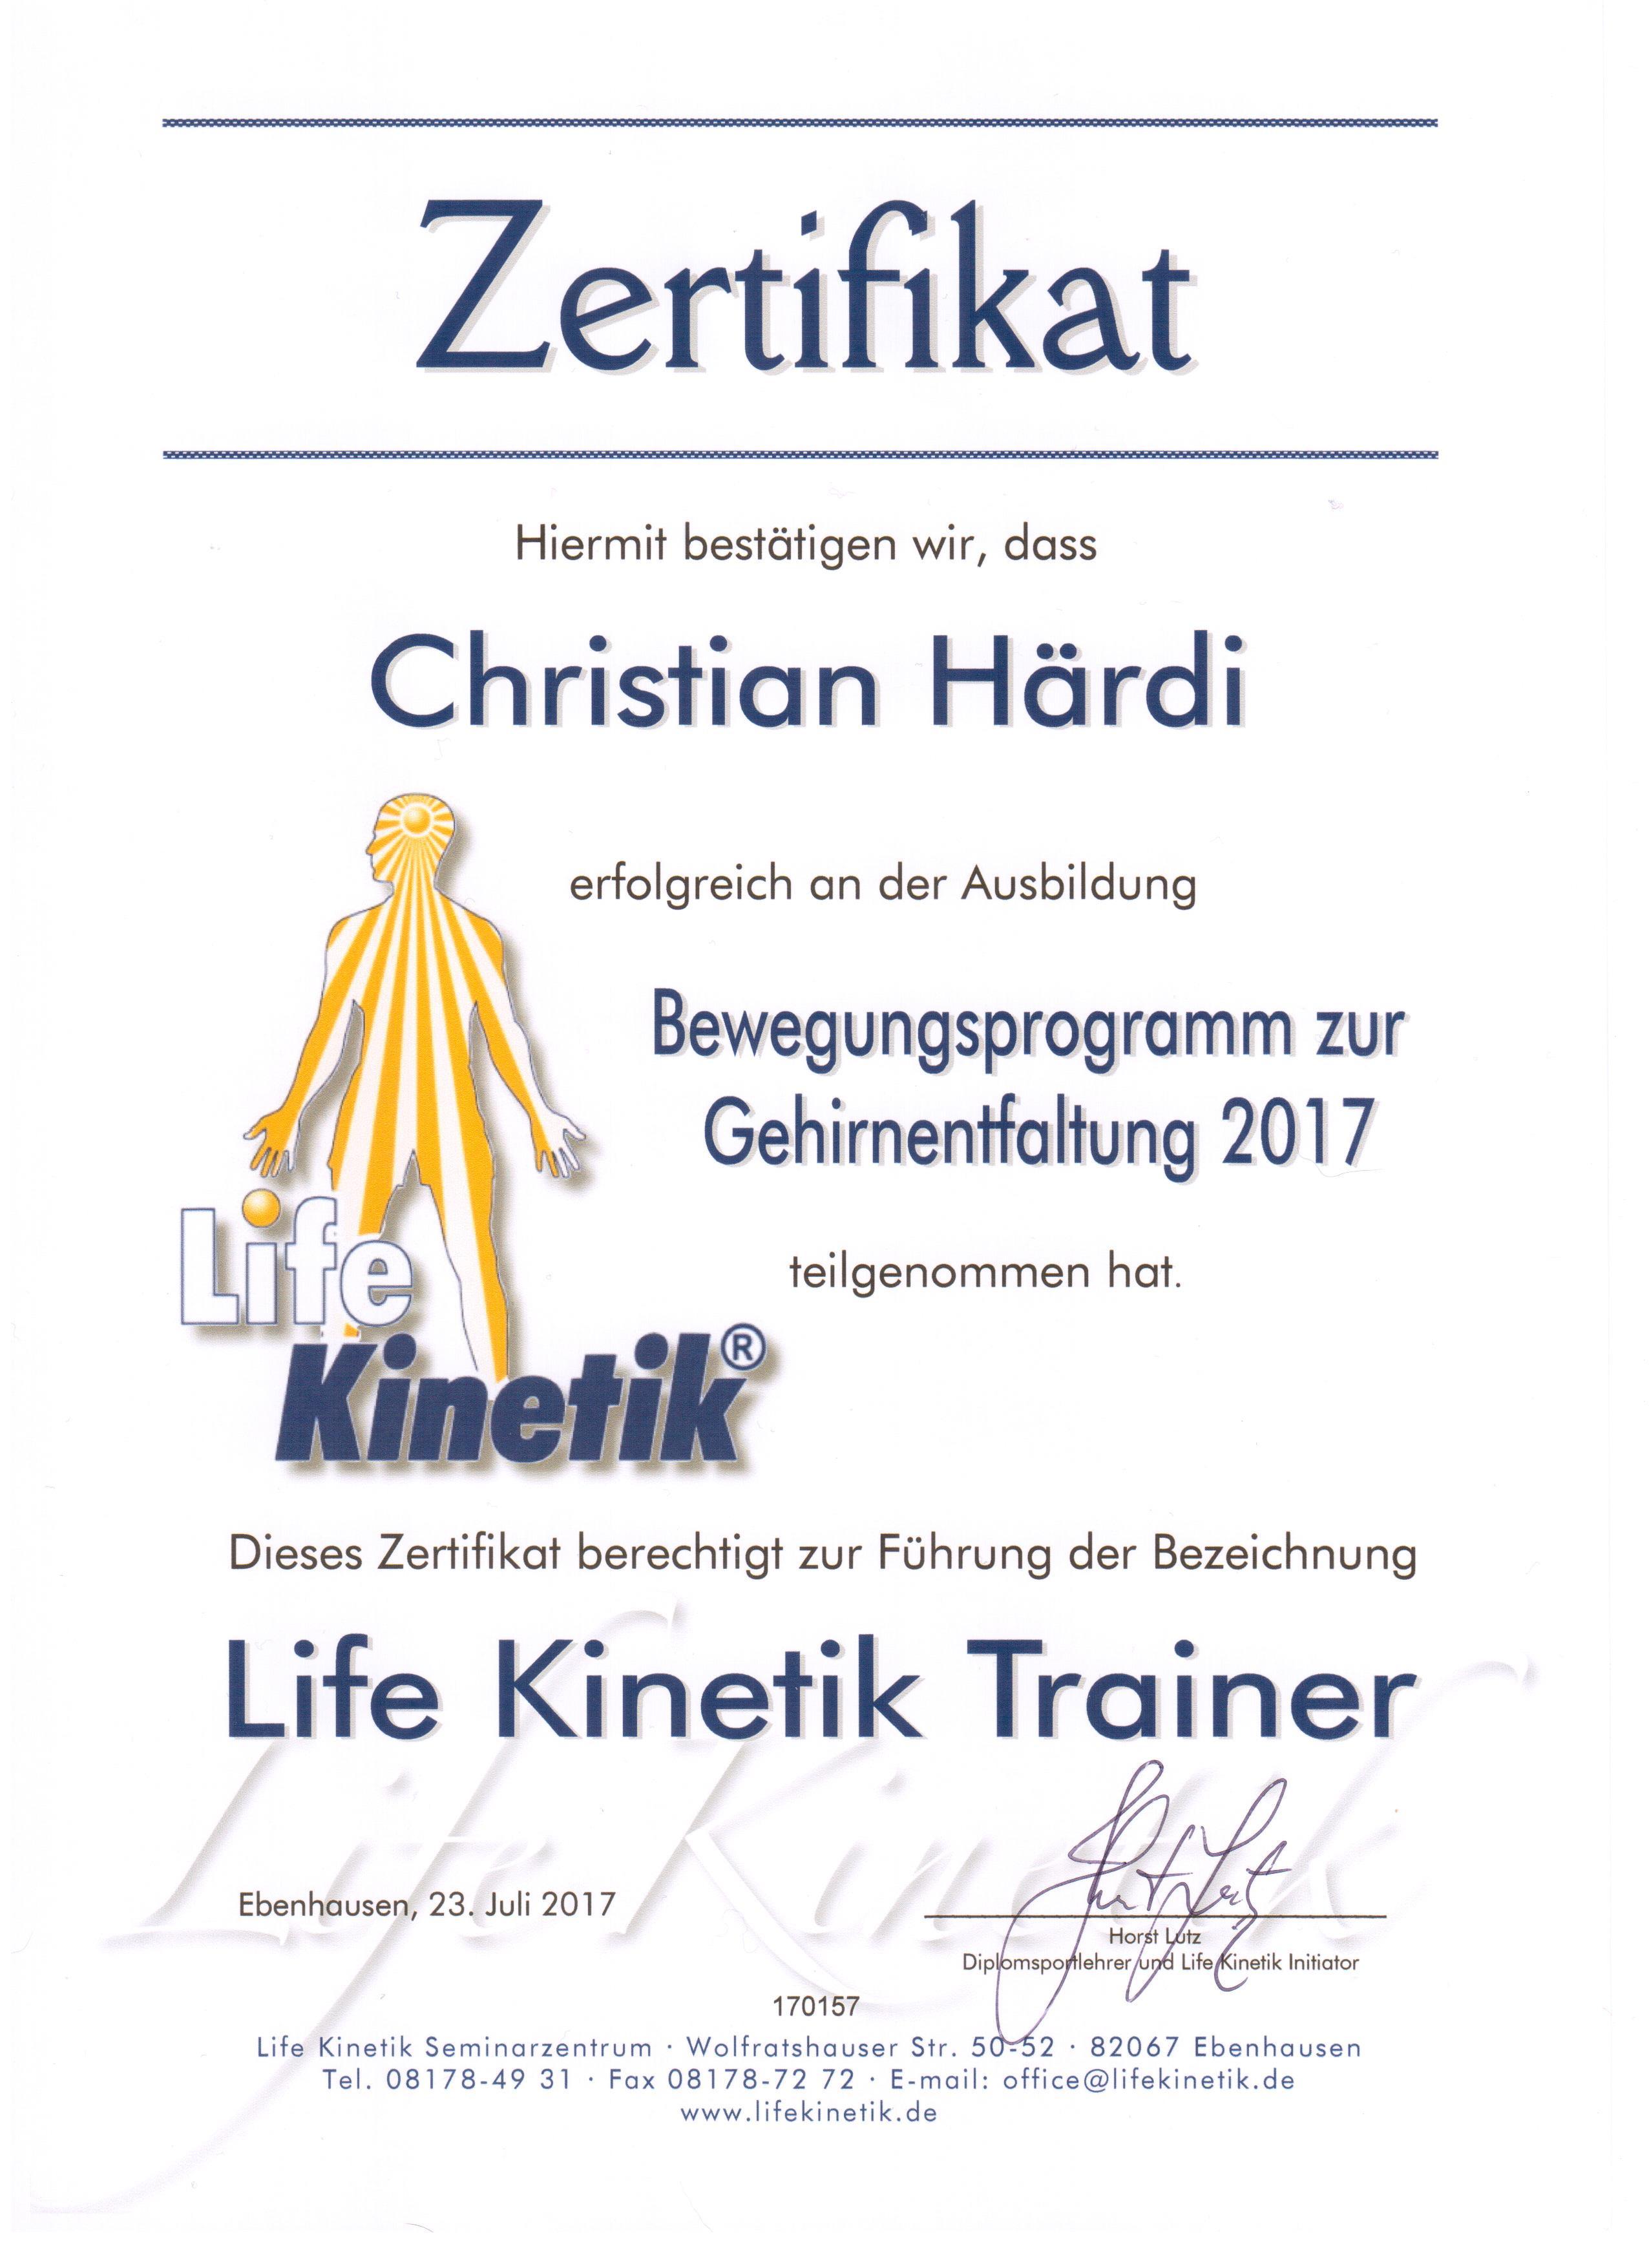 Life Kinetik Training